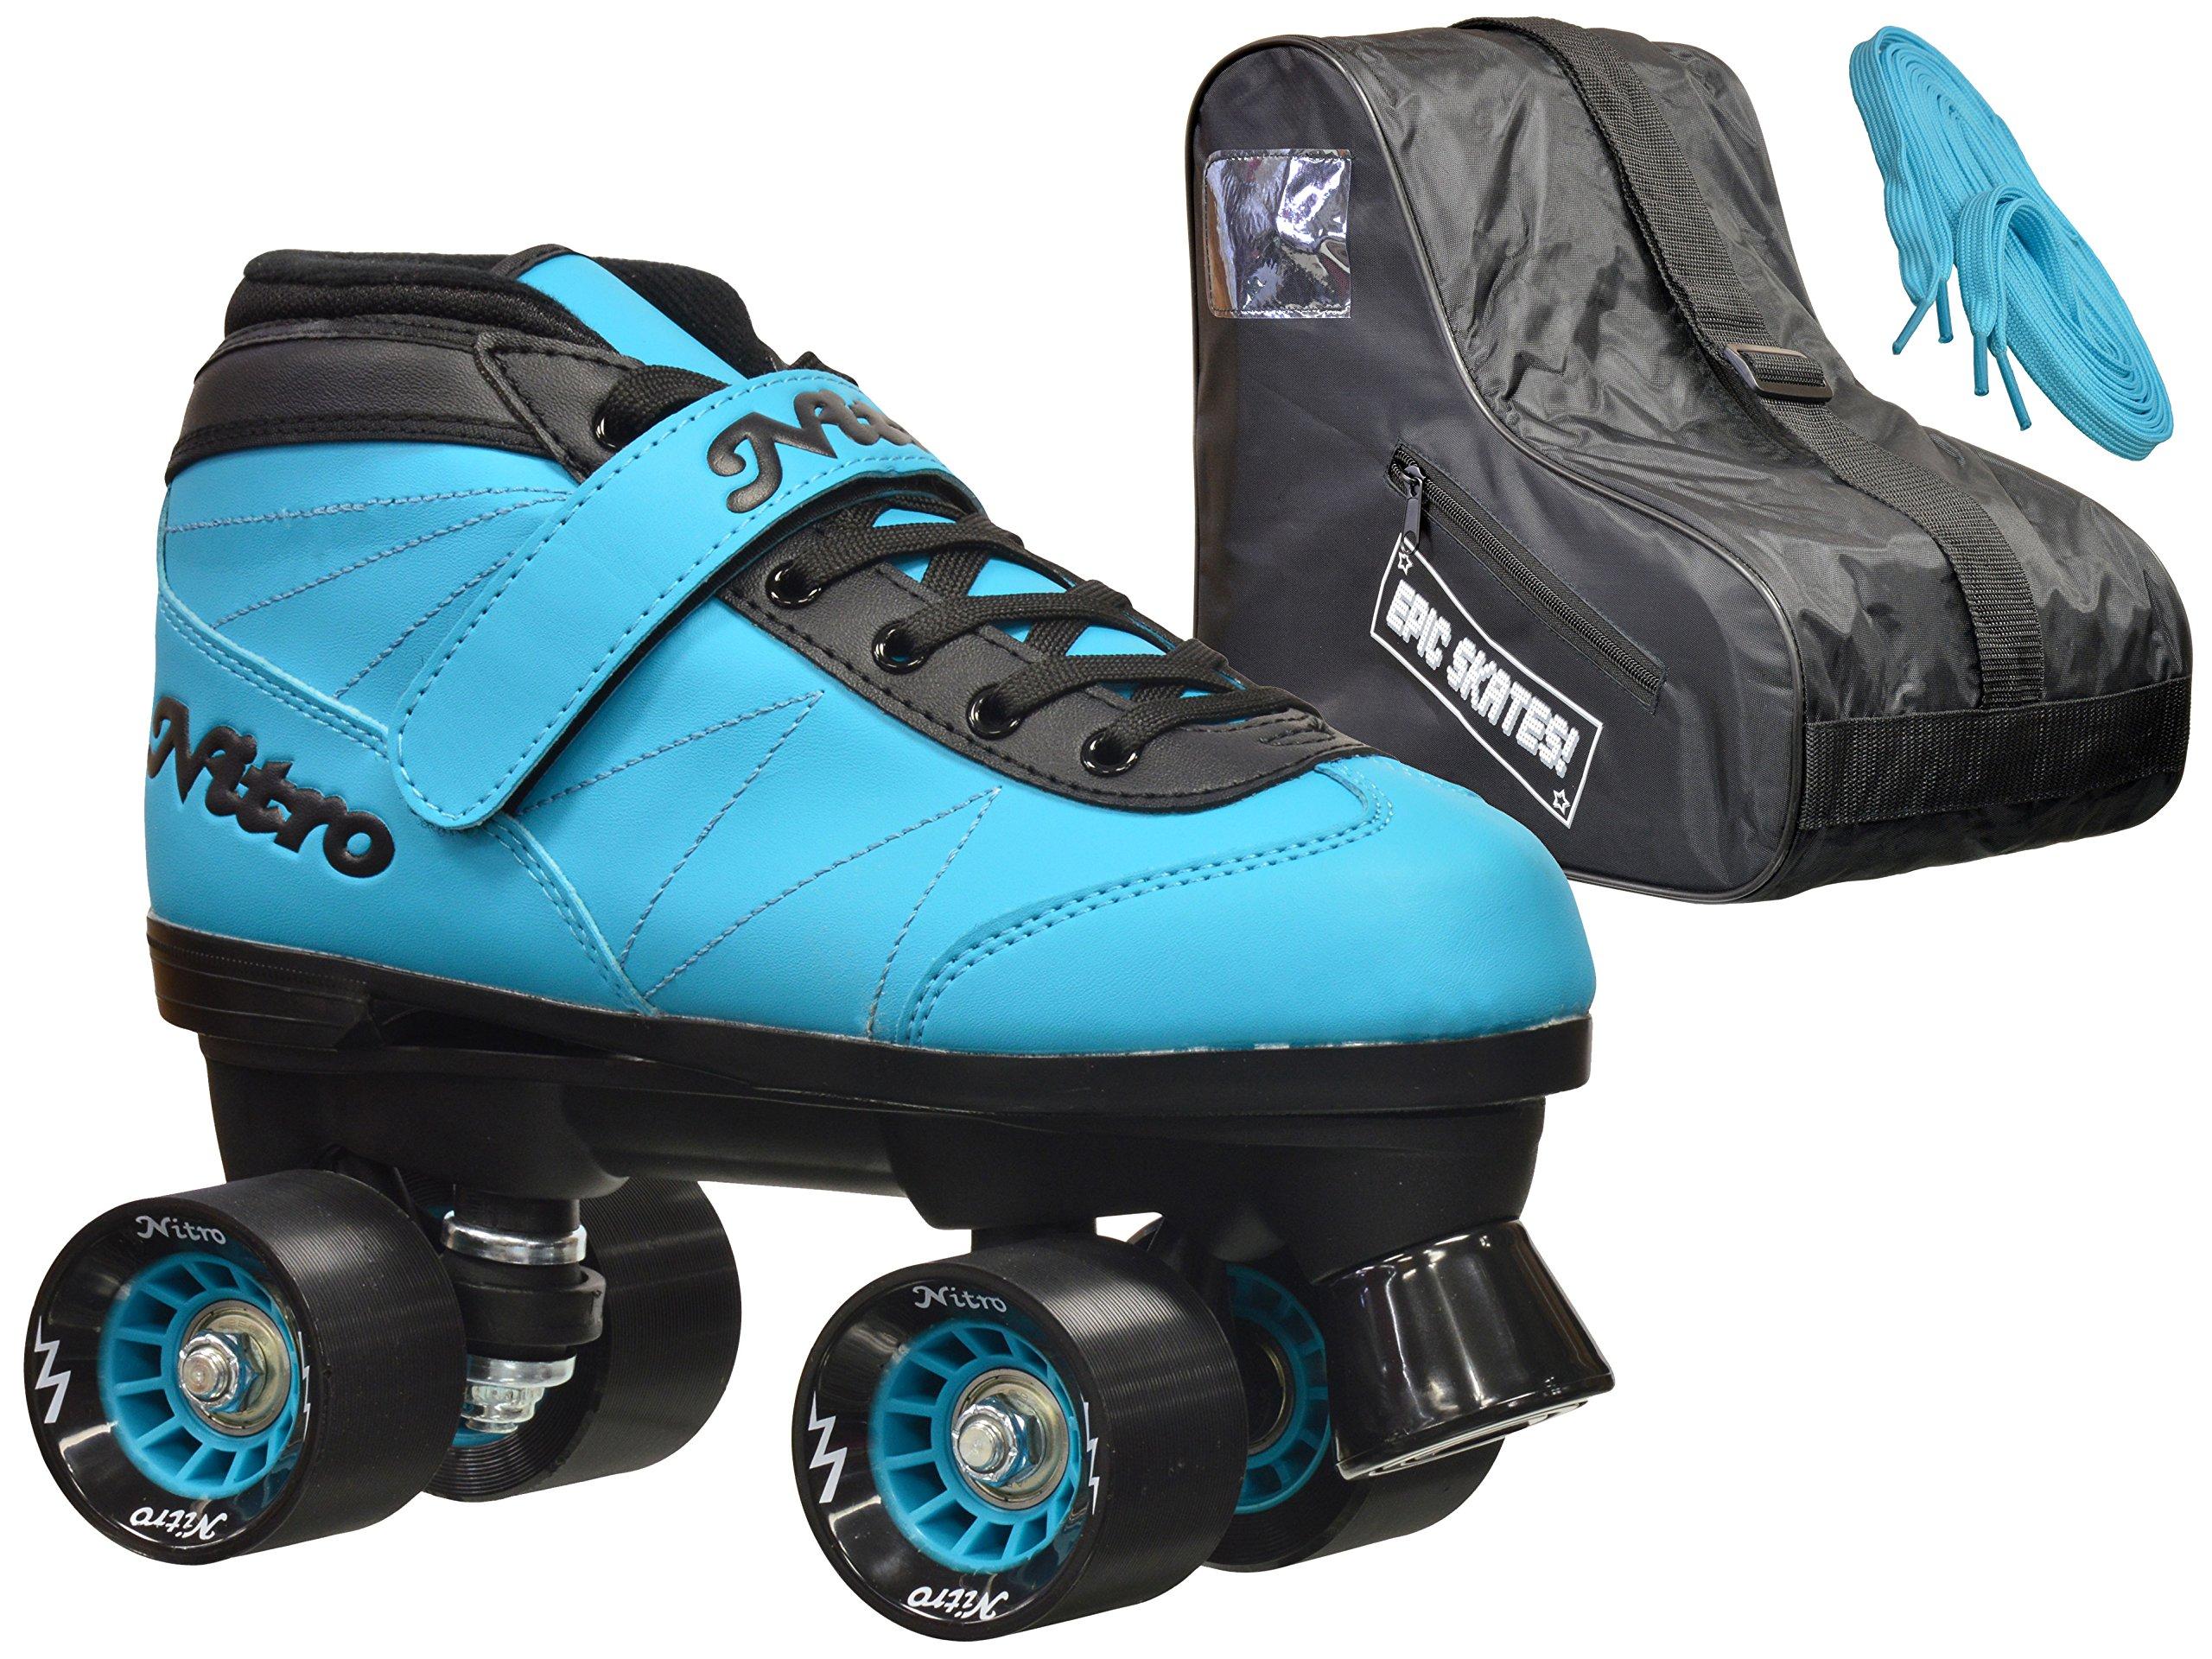 Epic Skates Epic Nitro Turbo Blue Quad Speed Roller Skates Package 8